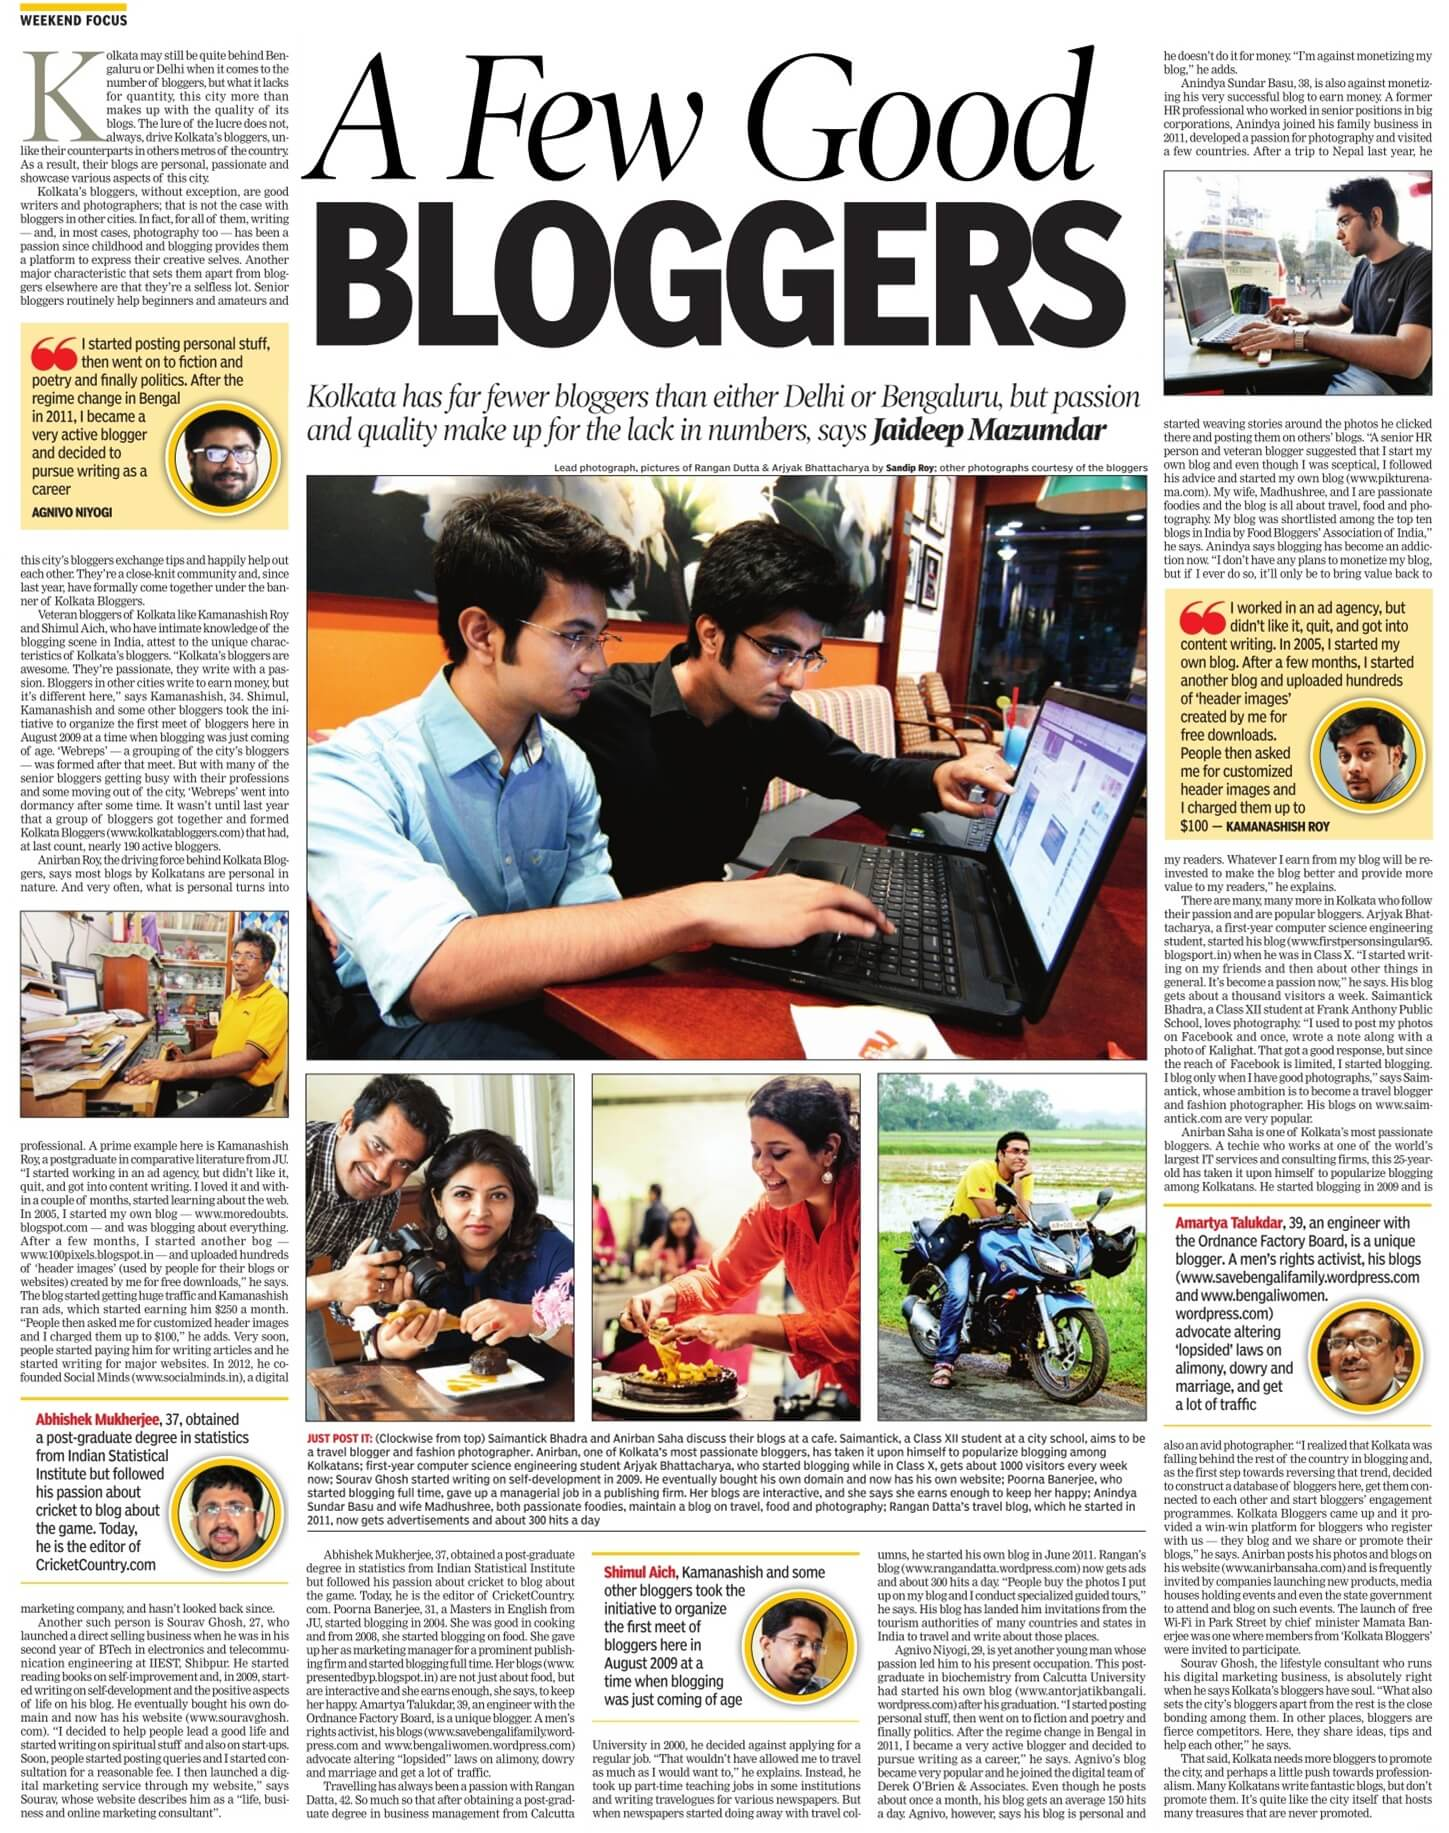 Few Good Bloggers Kolkata Bloggers on Times of India